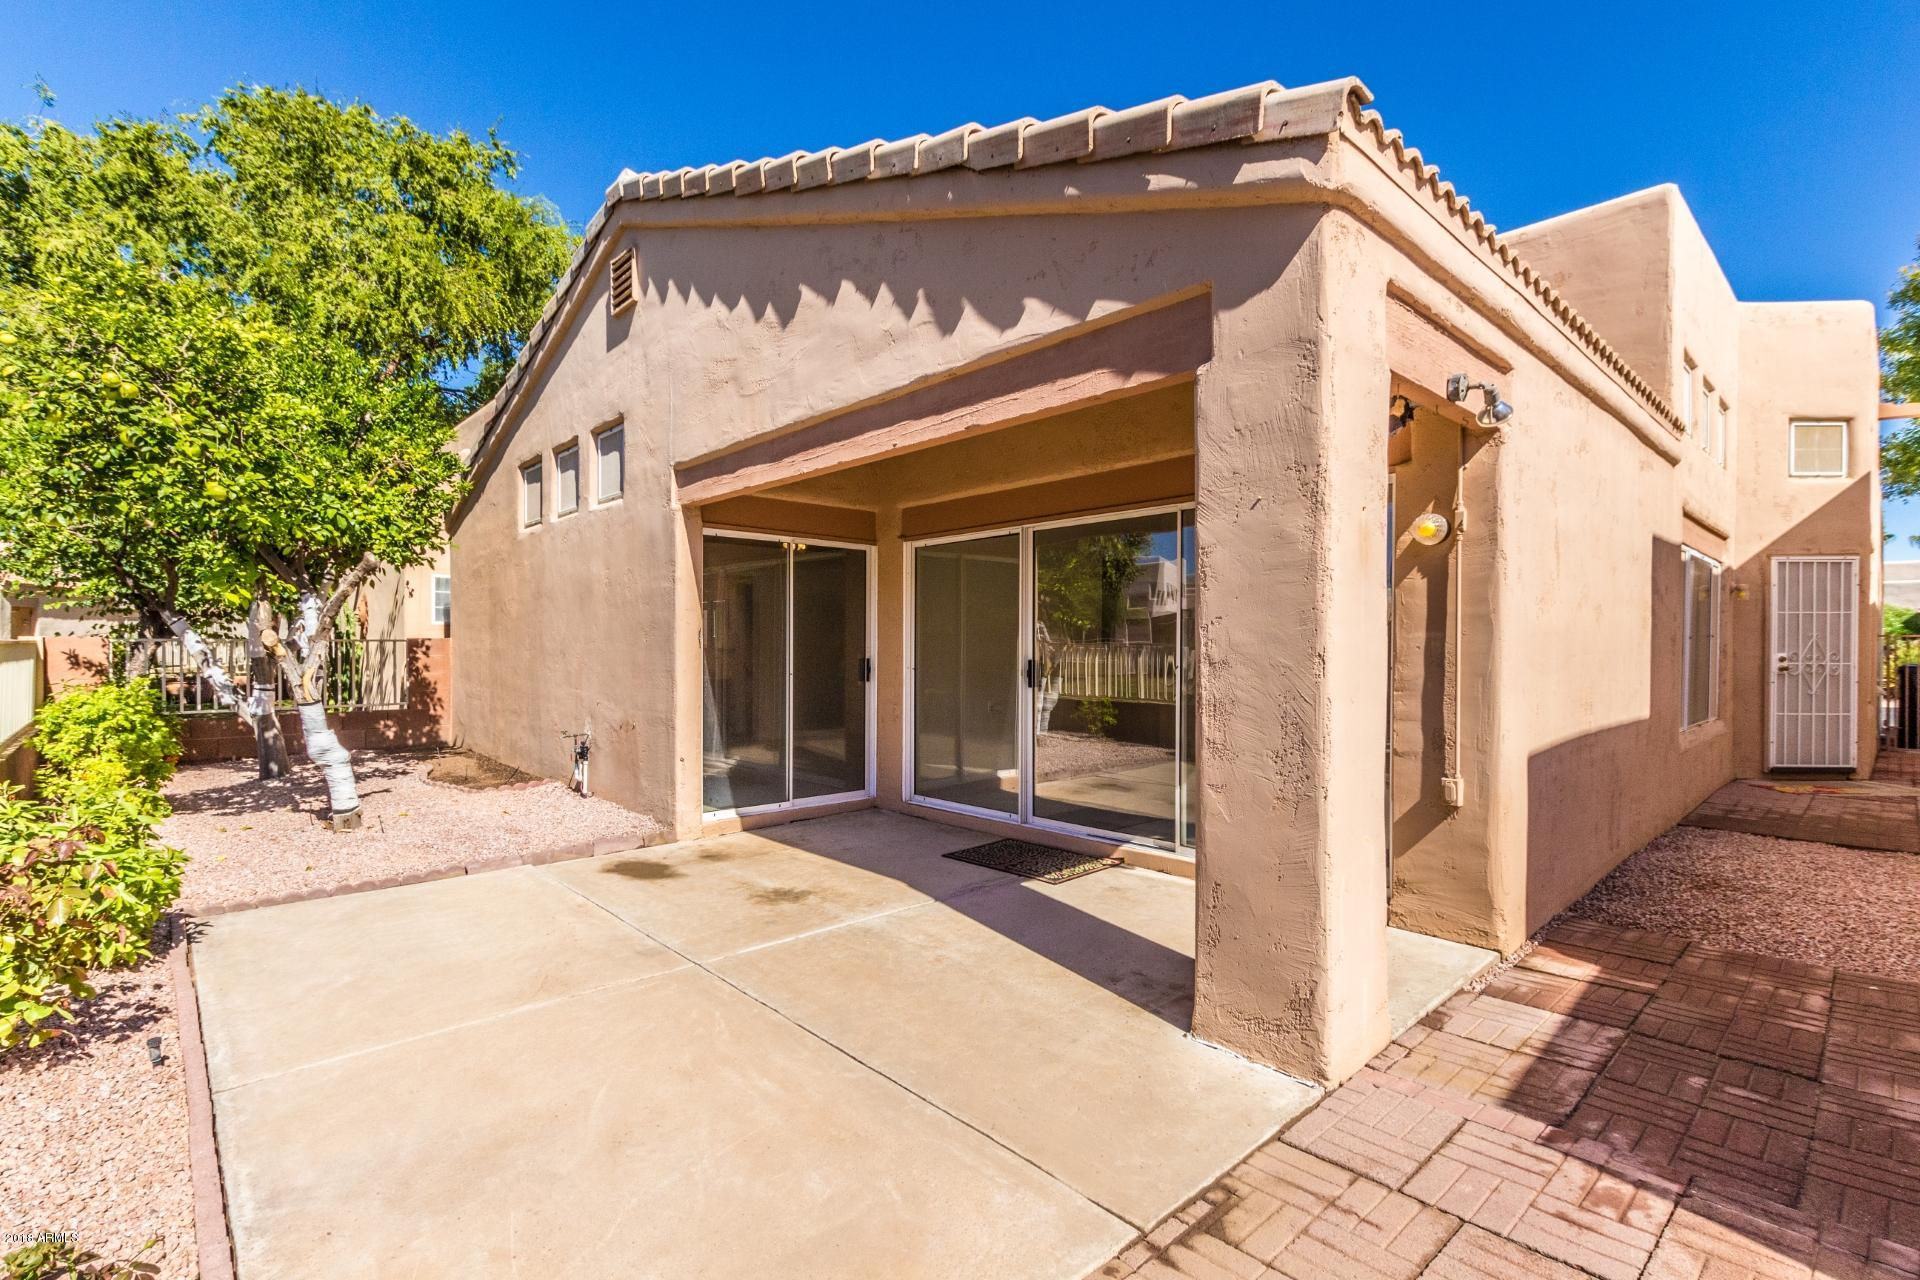 MLS 5836255 17224 N ZUNI Trail, Surprise, AZ 85374 Surprise AZ Sun Village